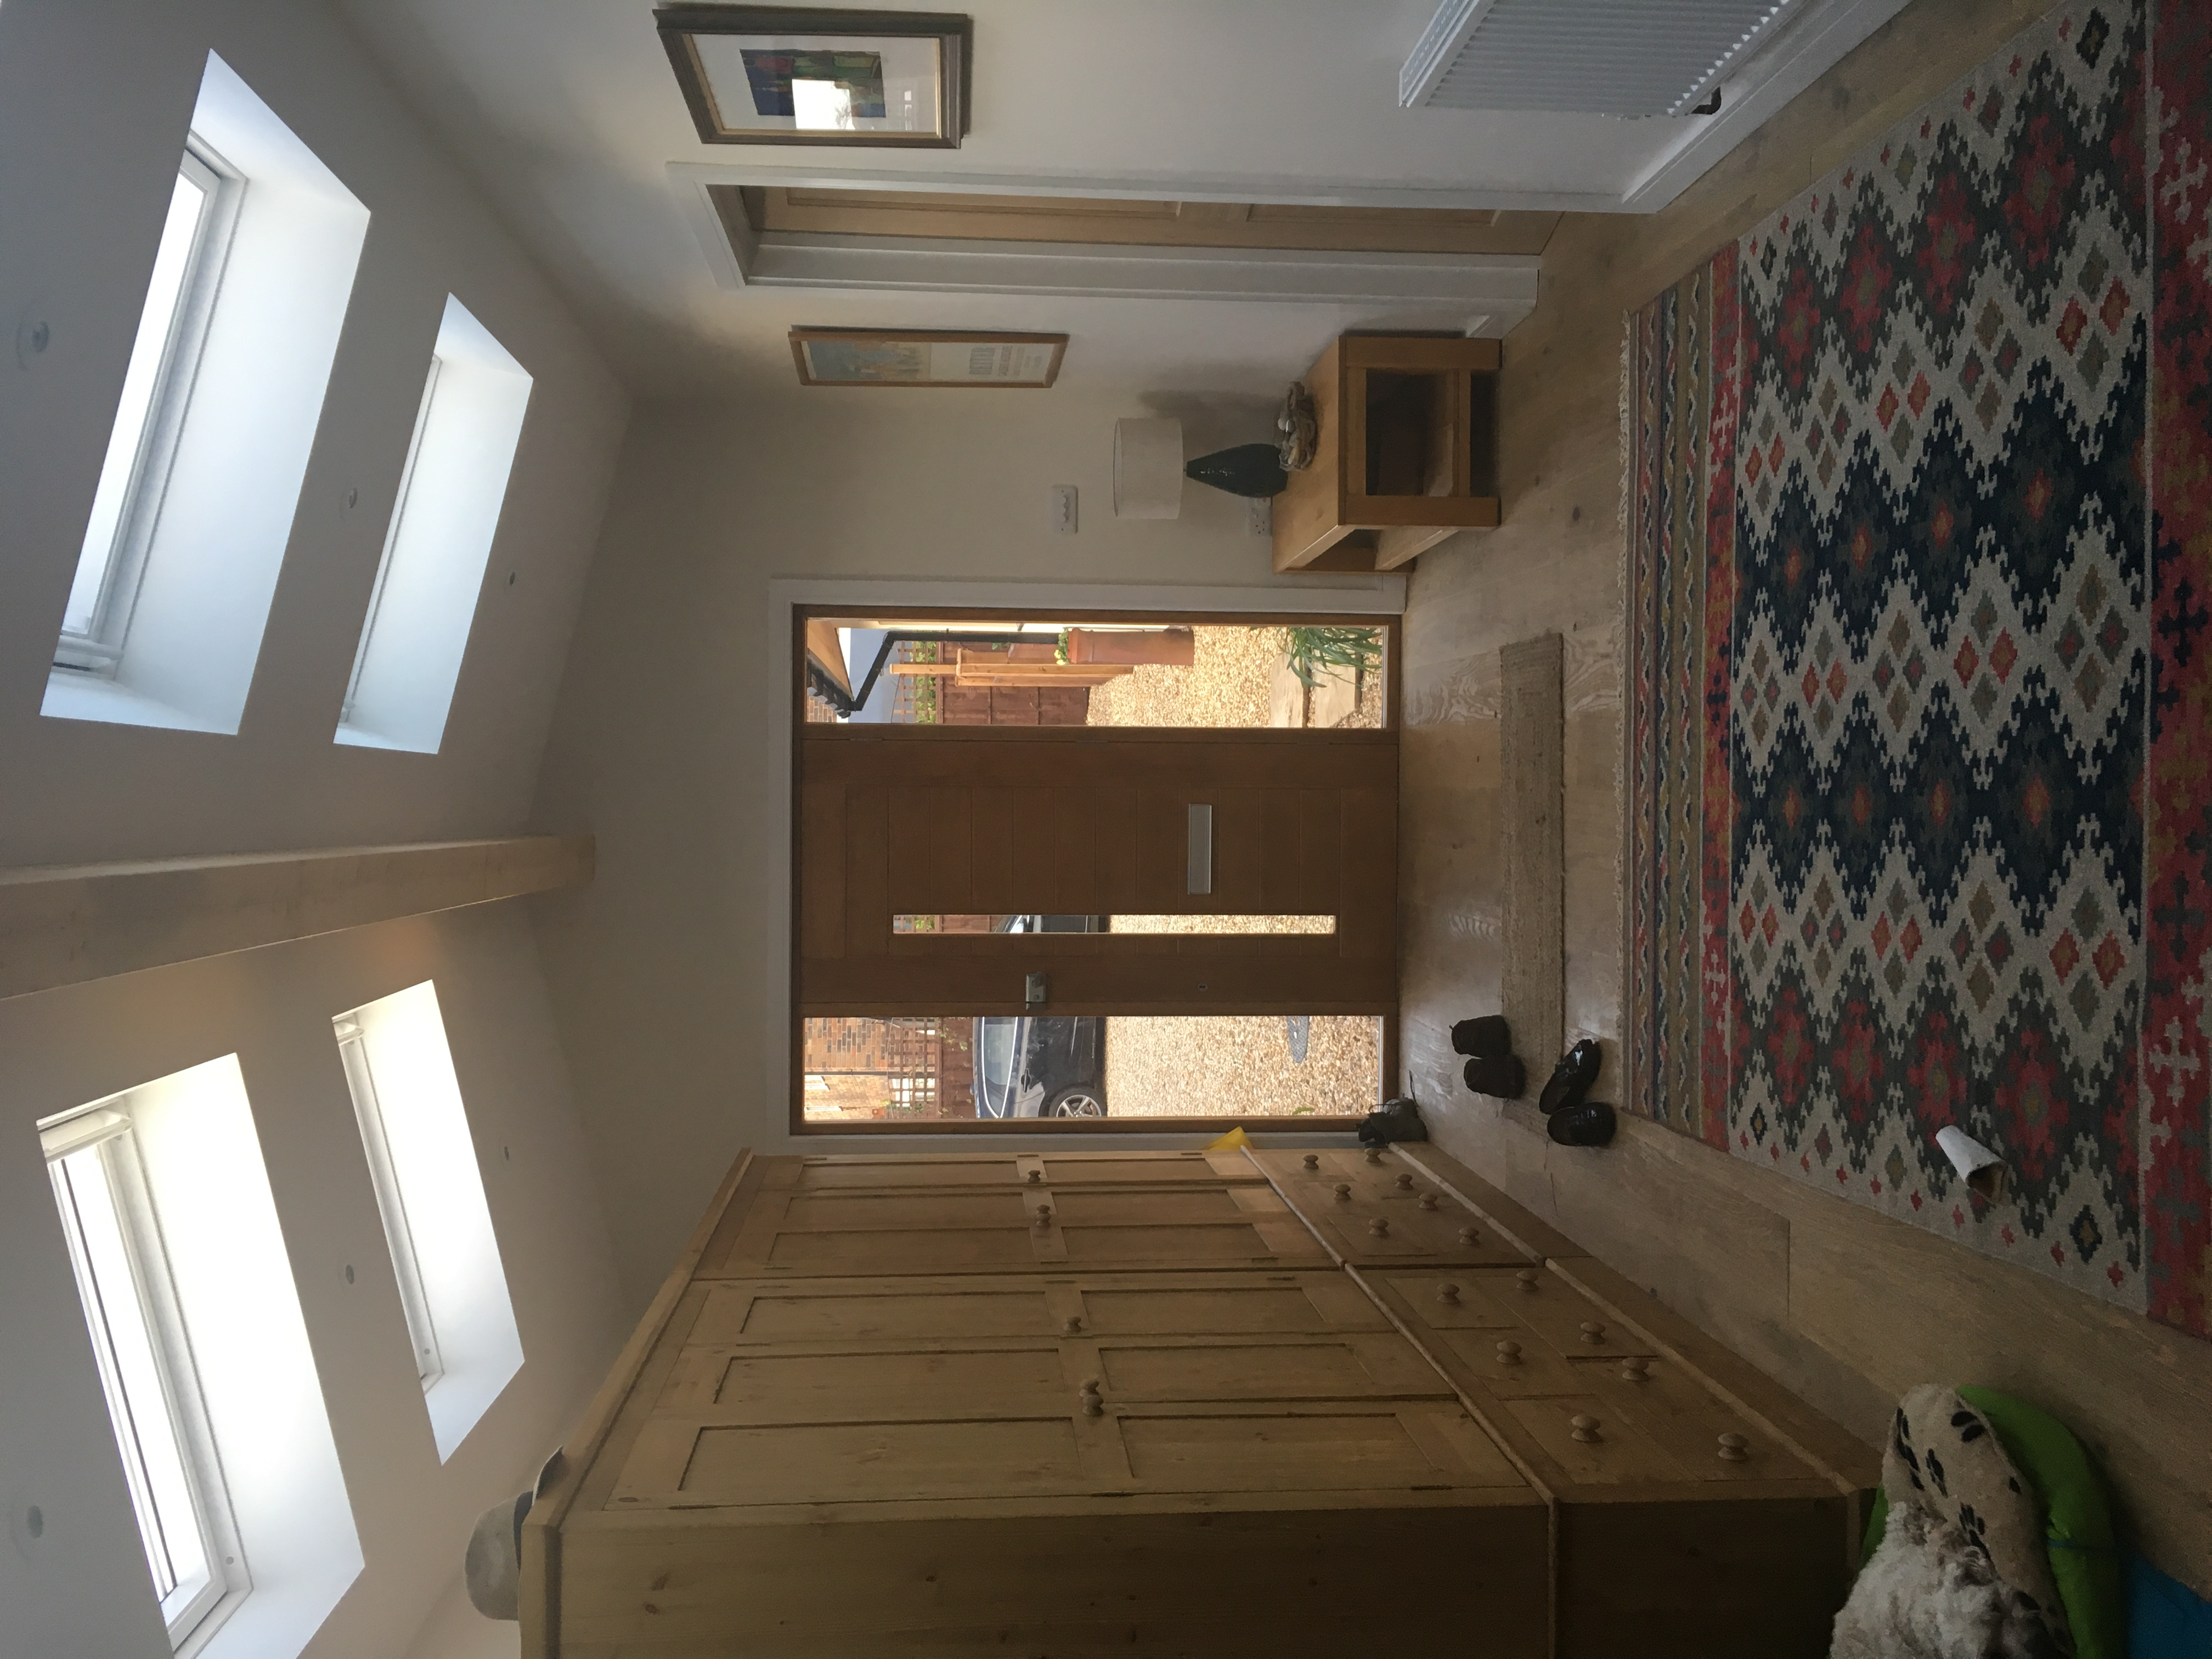 Bosham Vaulted Ceiling